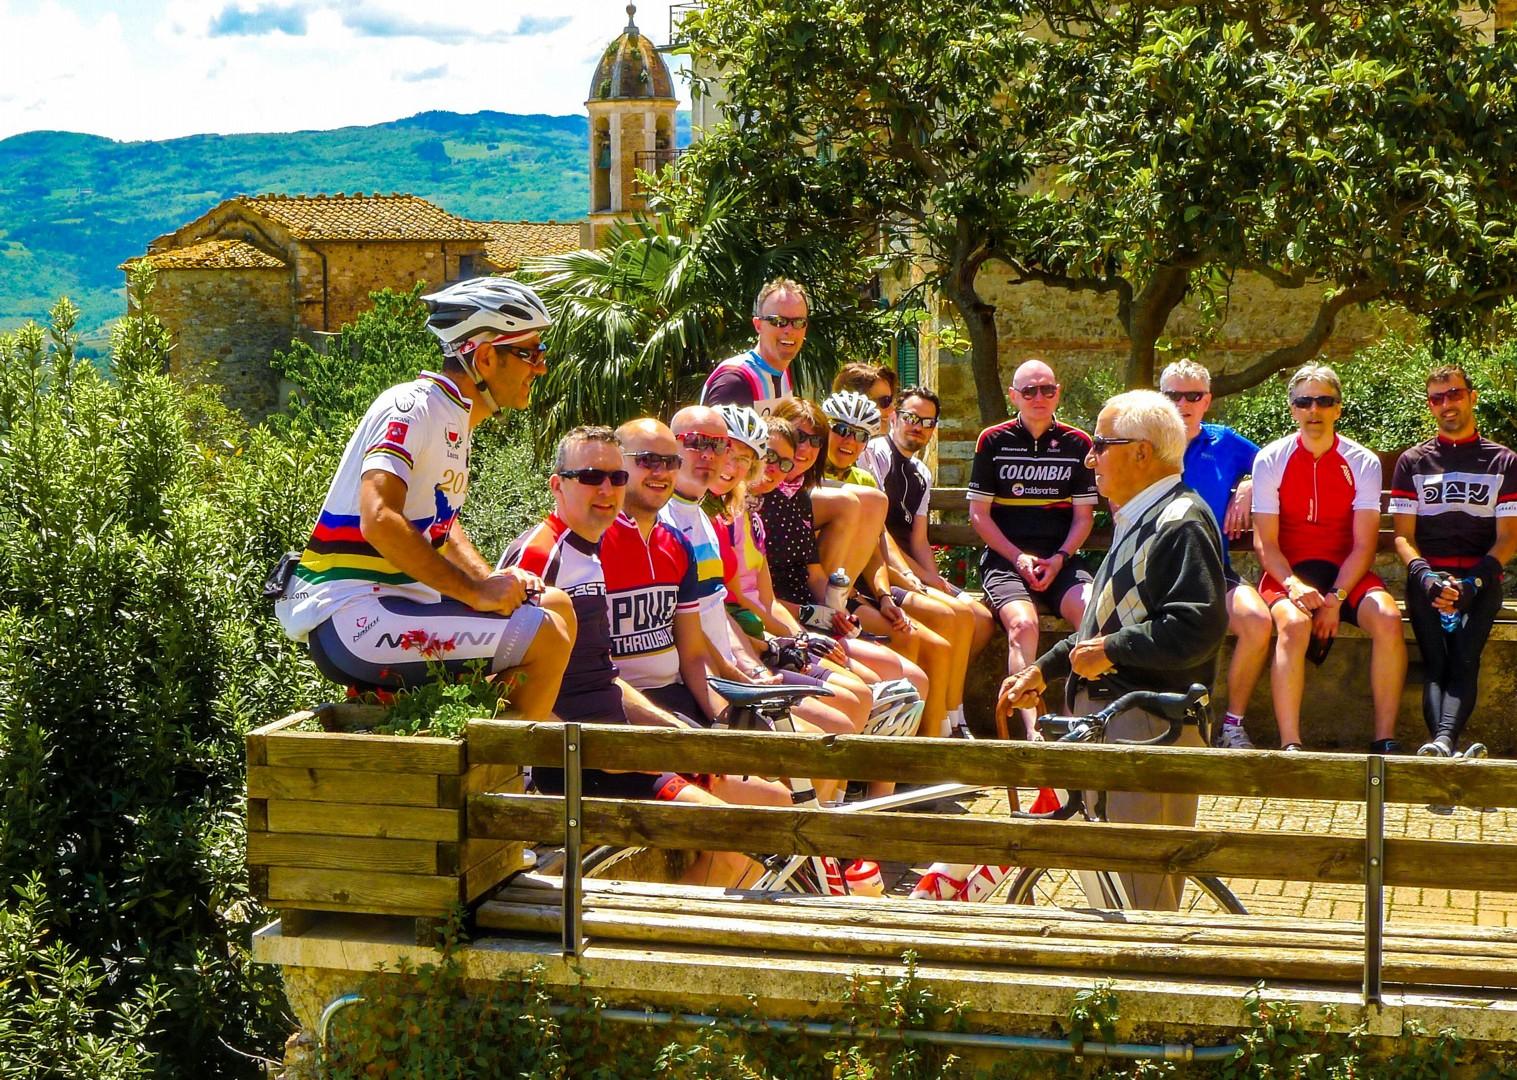 79.jpg - Italy - Tuscany - Giro della Toscana - Guided Road Cycling Holiday - Road Cycling